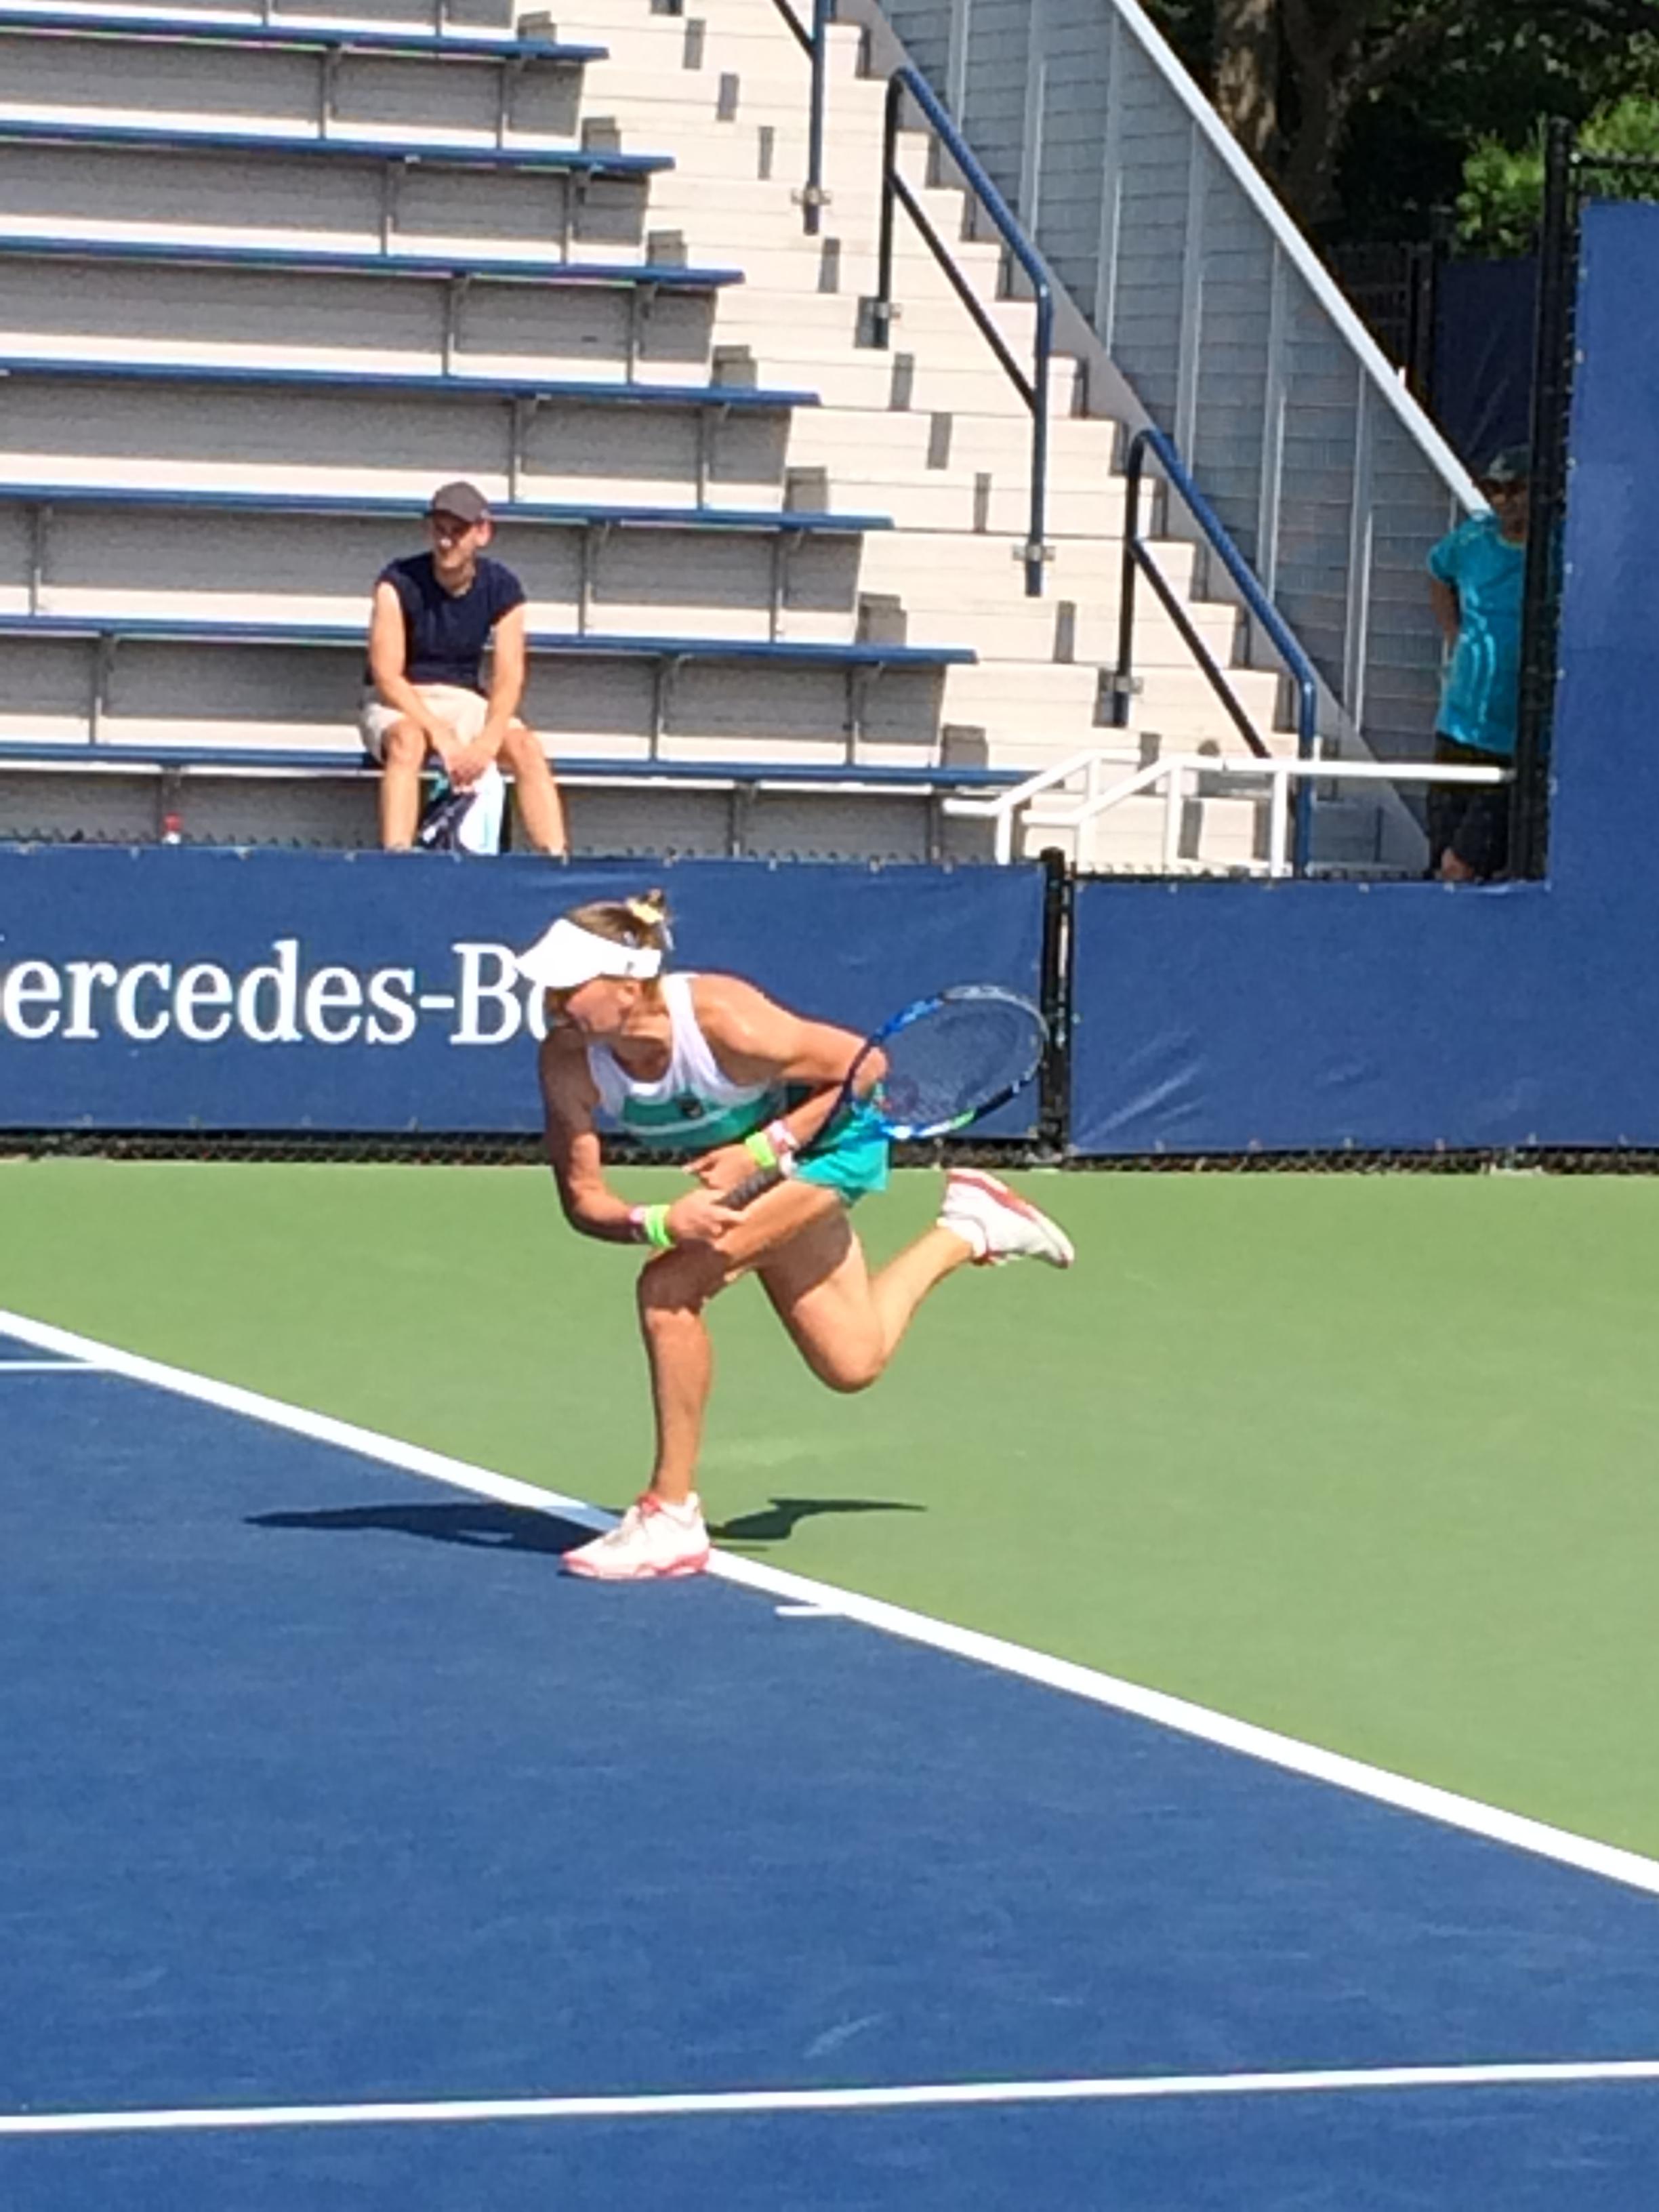 Vera Zvonareva, 2017 US Open